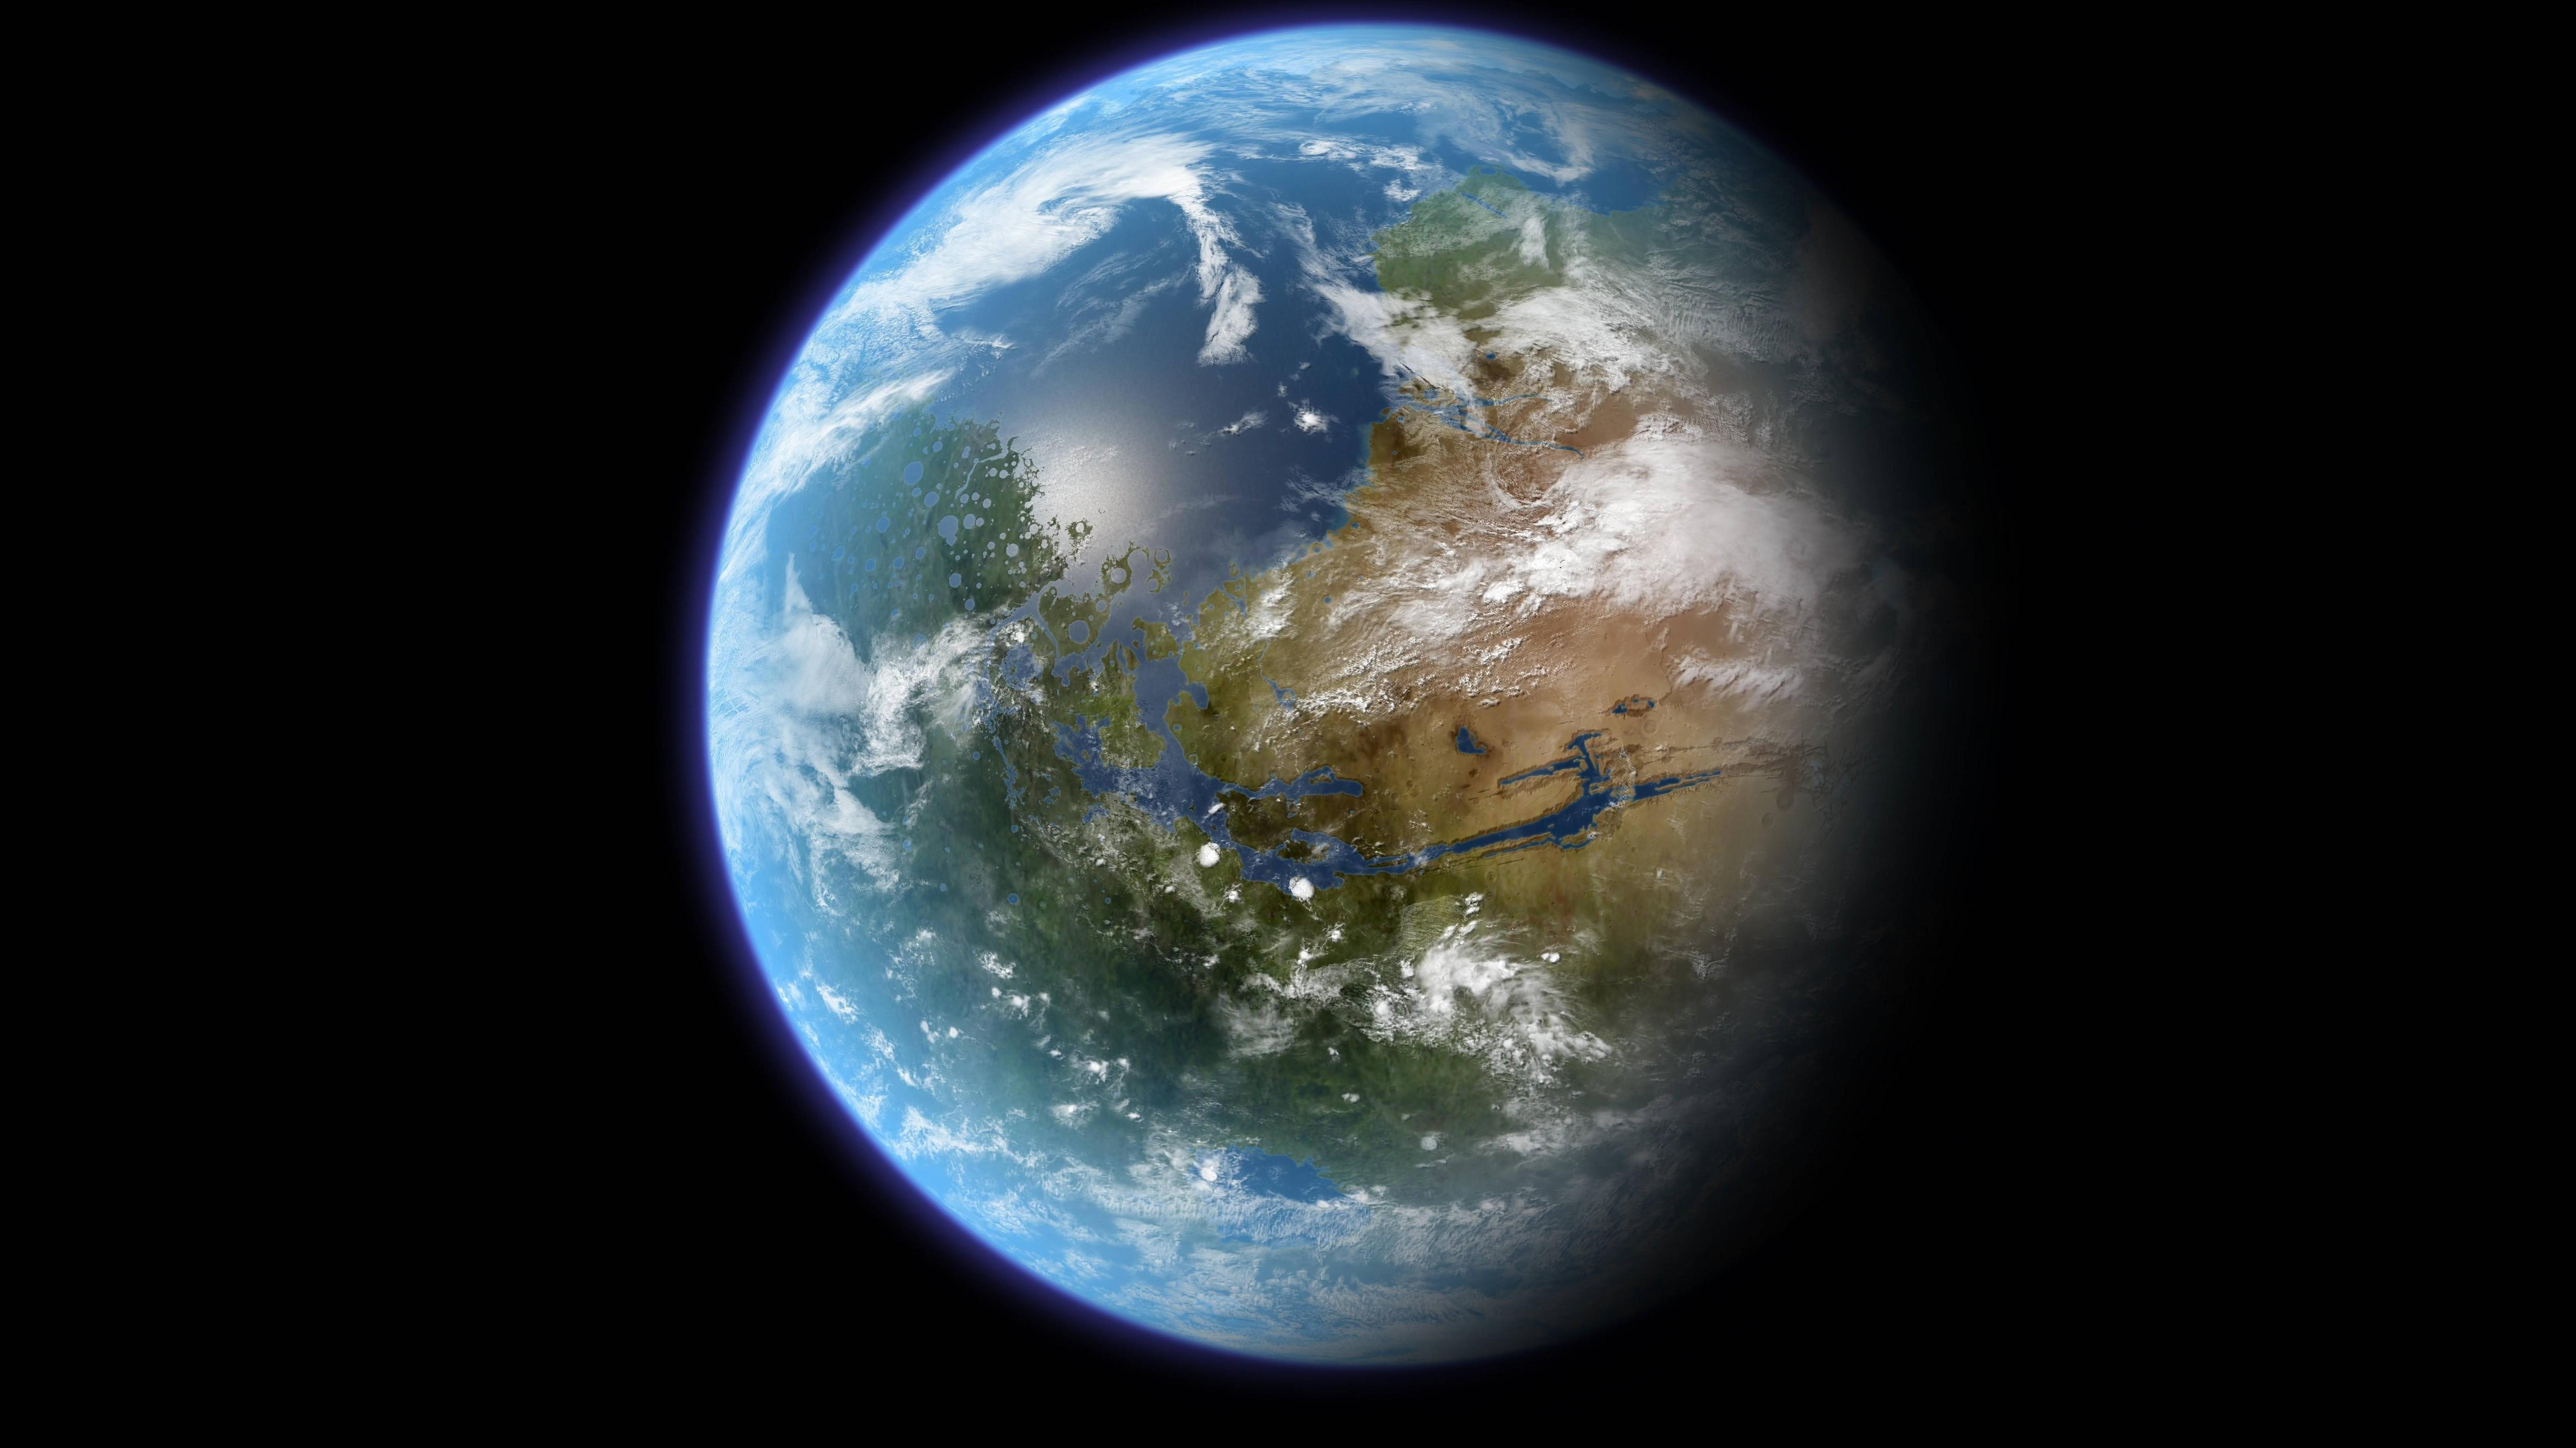 Planet Earth Bedroom Wallpaper photo - 2